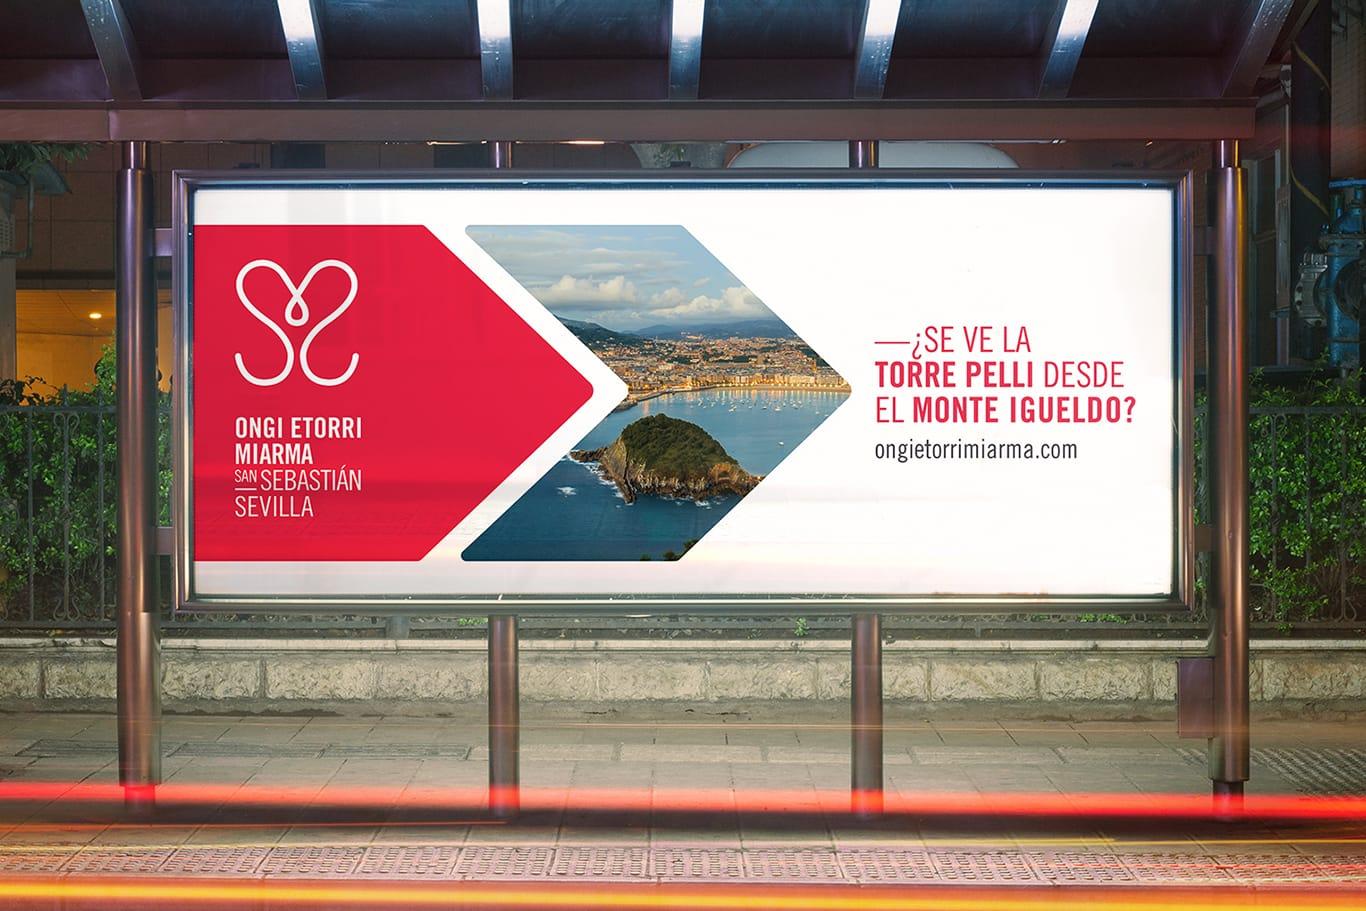 Proyecto de naming, branding para Ongi Etorri Miarma